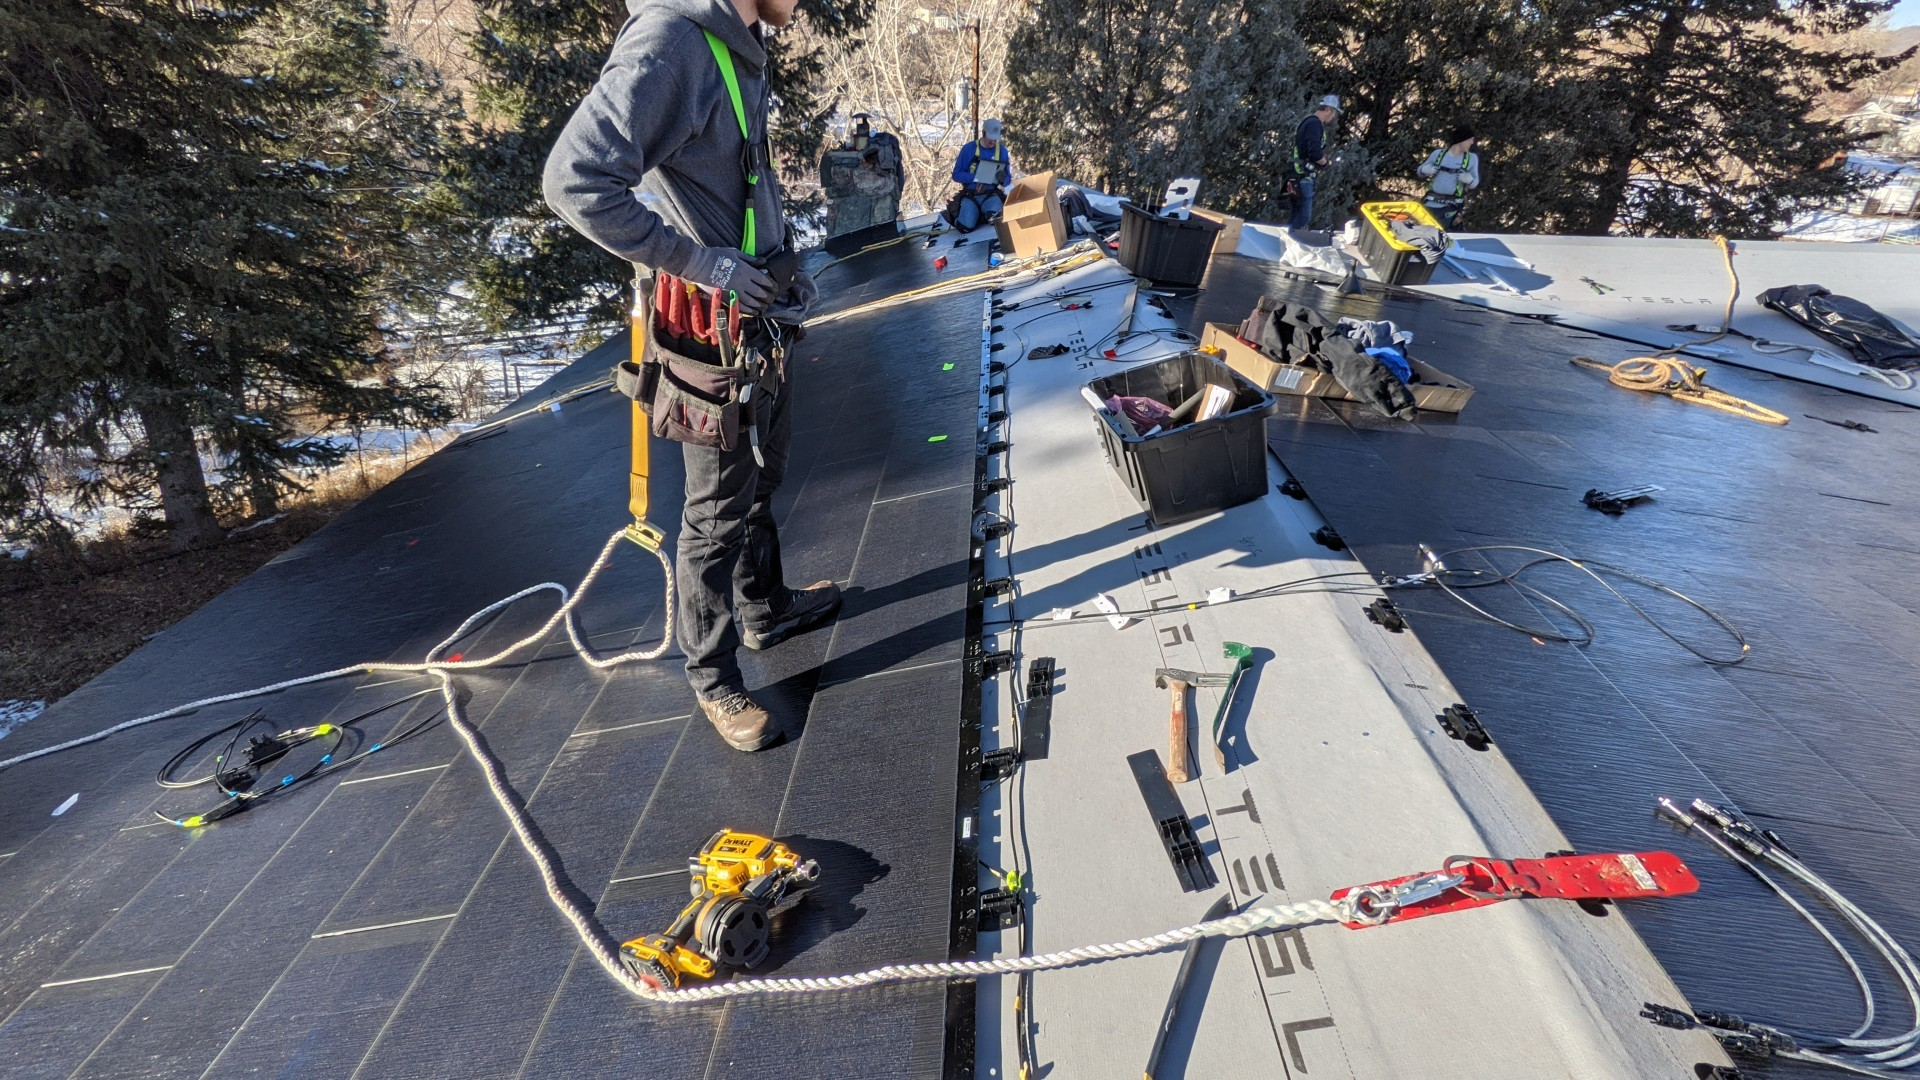 Установка Tesla Solar Roof 12kW завершена за один день